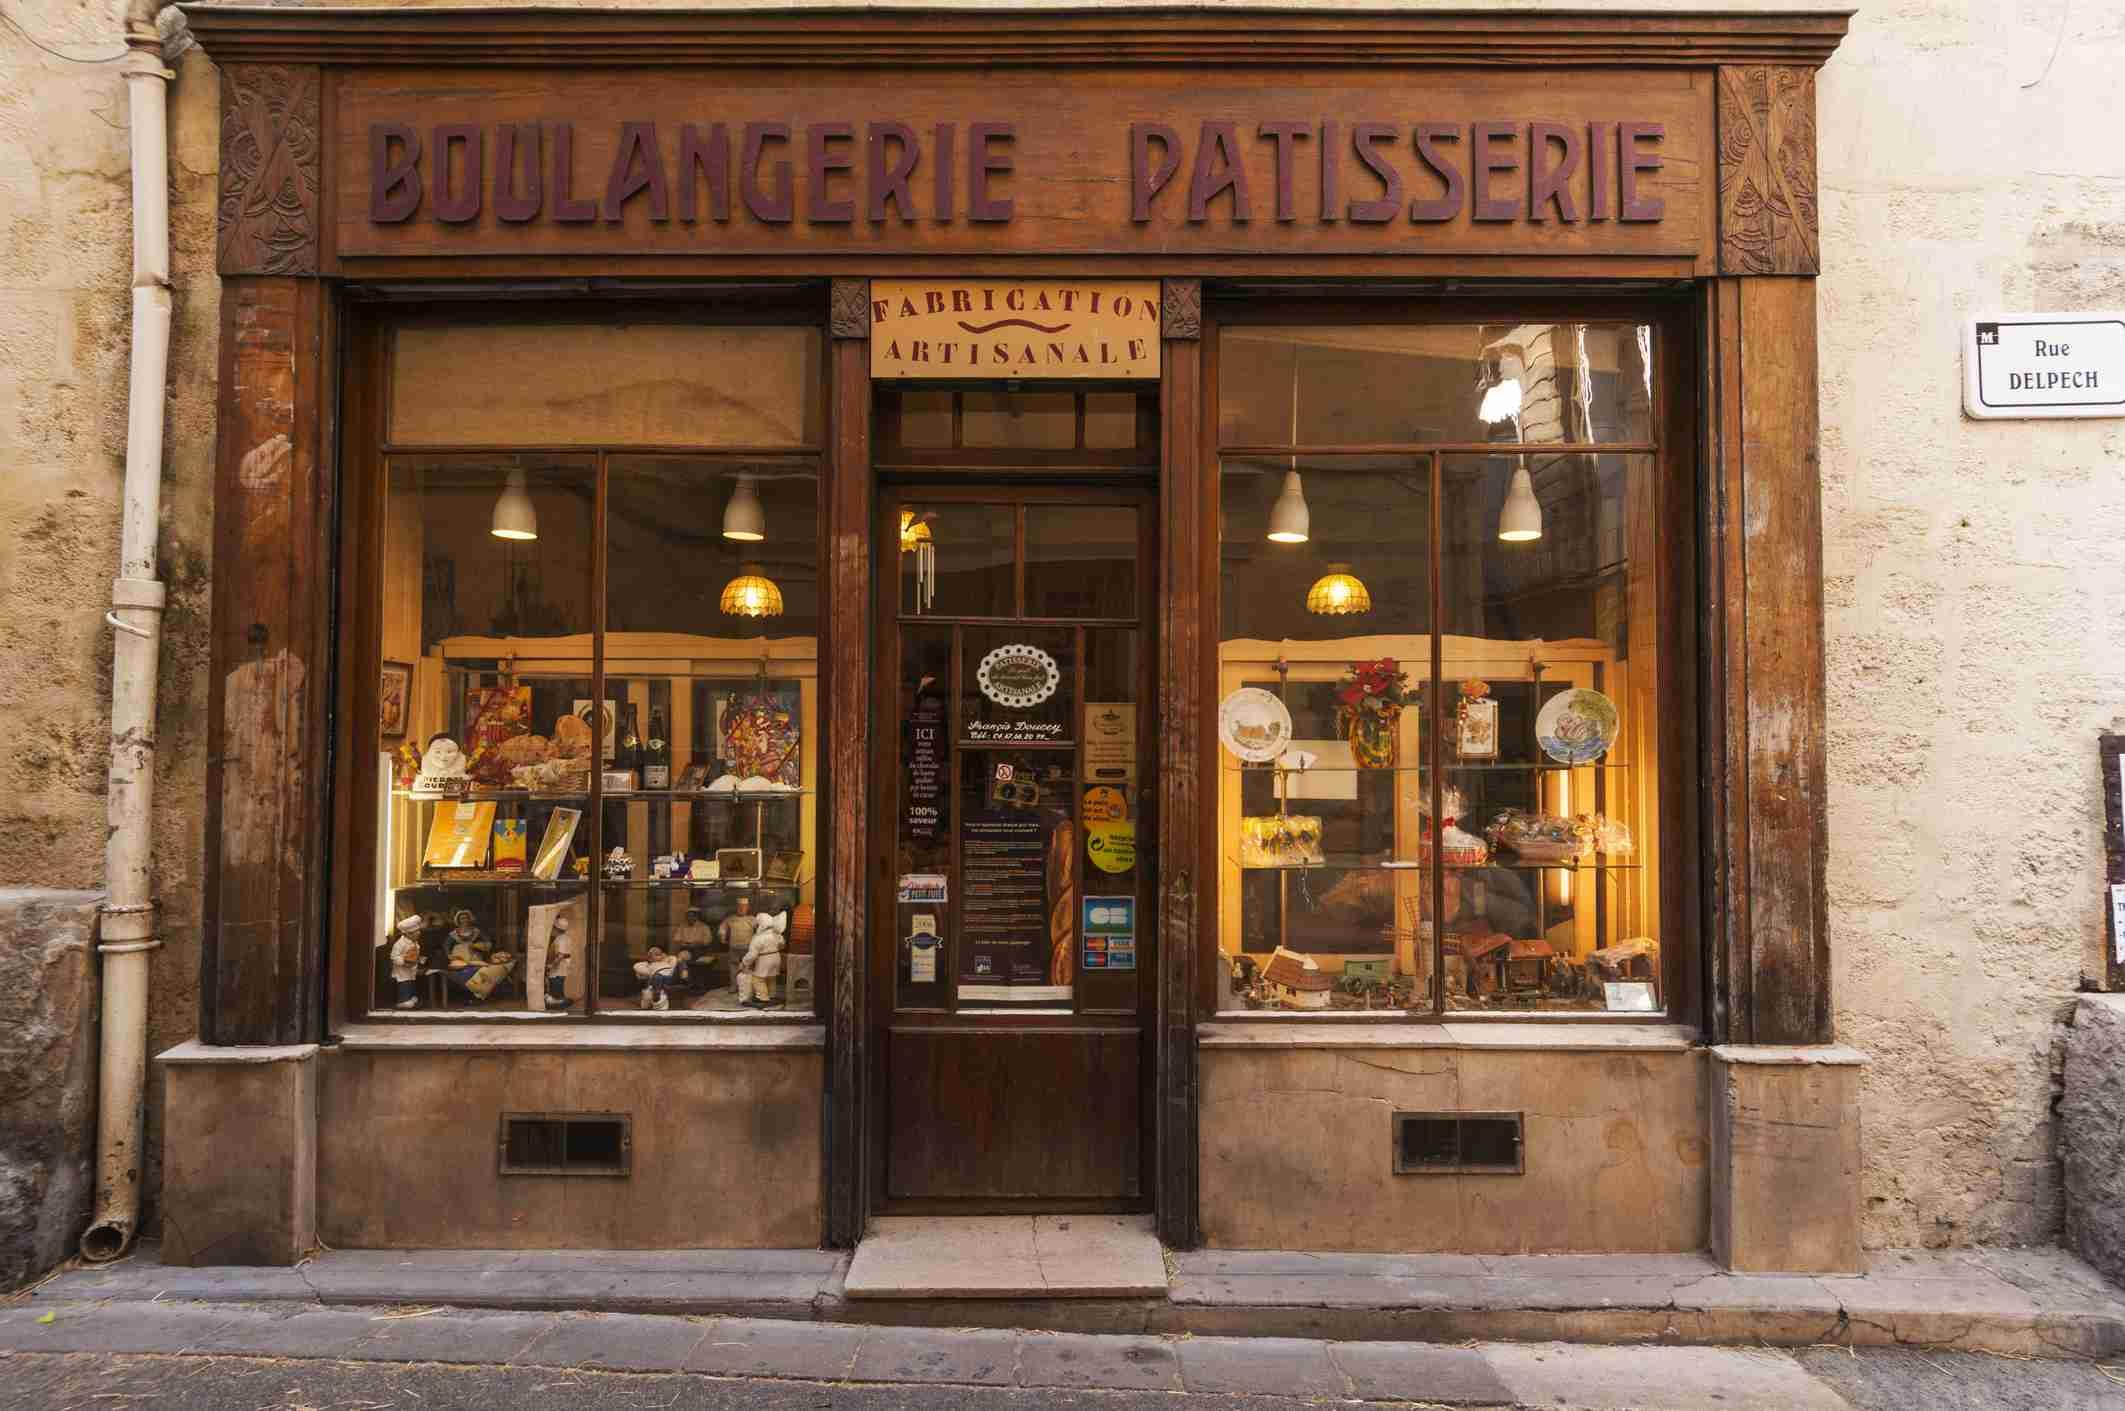 The exterior of a Parisian Patisserie